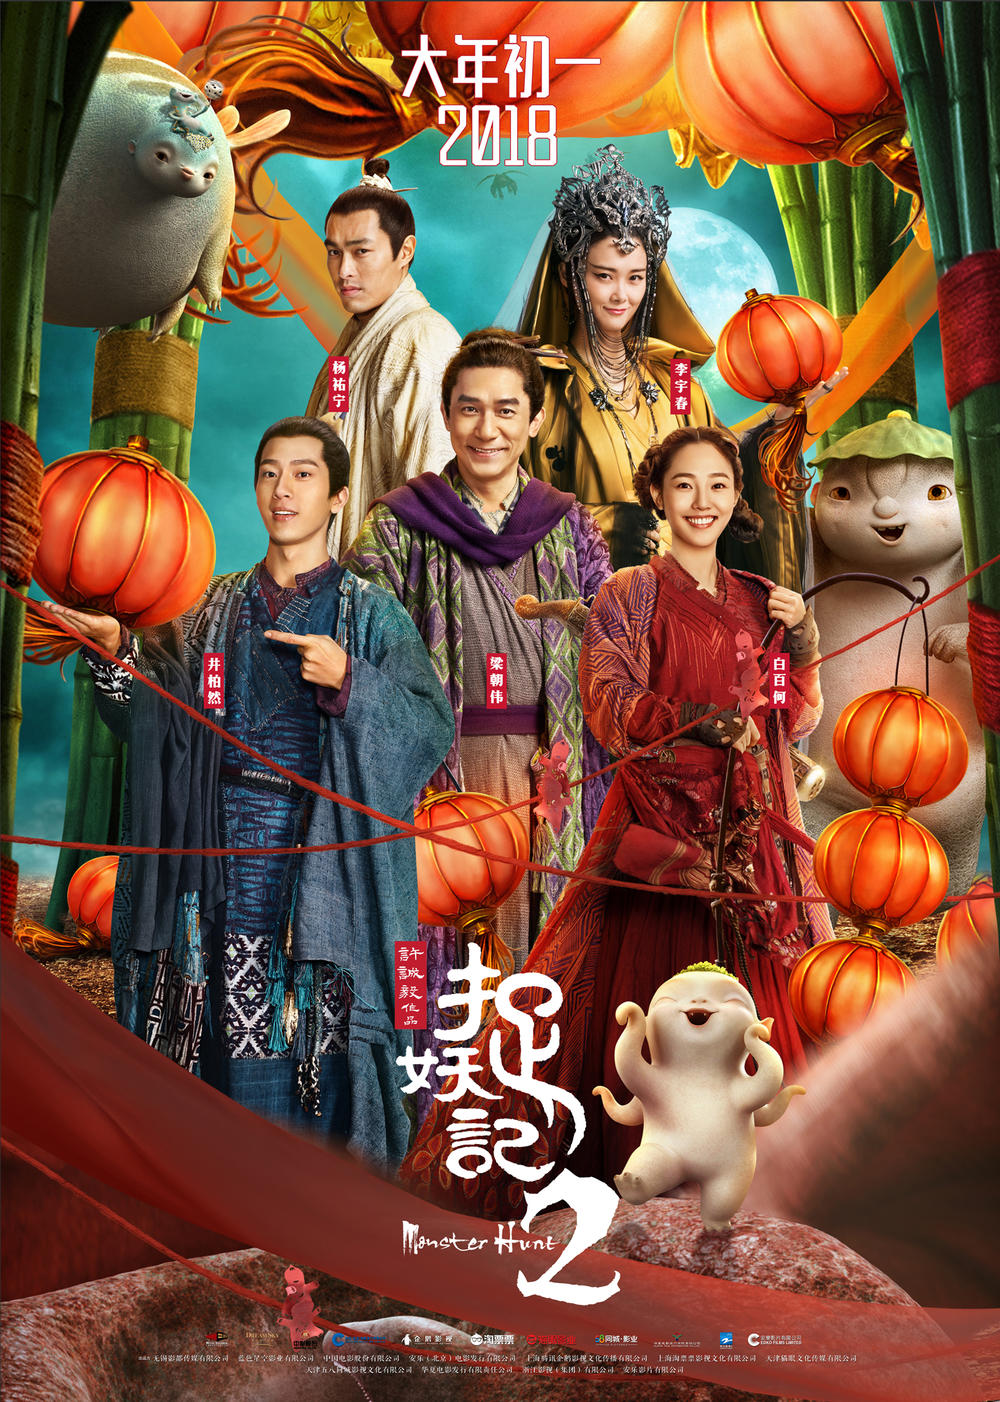 Pennsylvasia Upcoming Chinese Movies The Monkey King 3 西遊記女兒